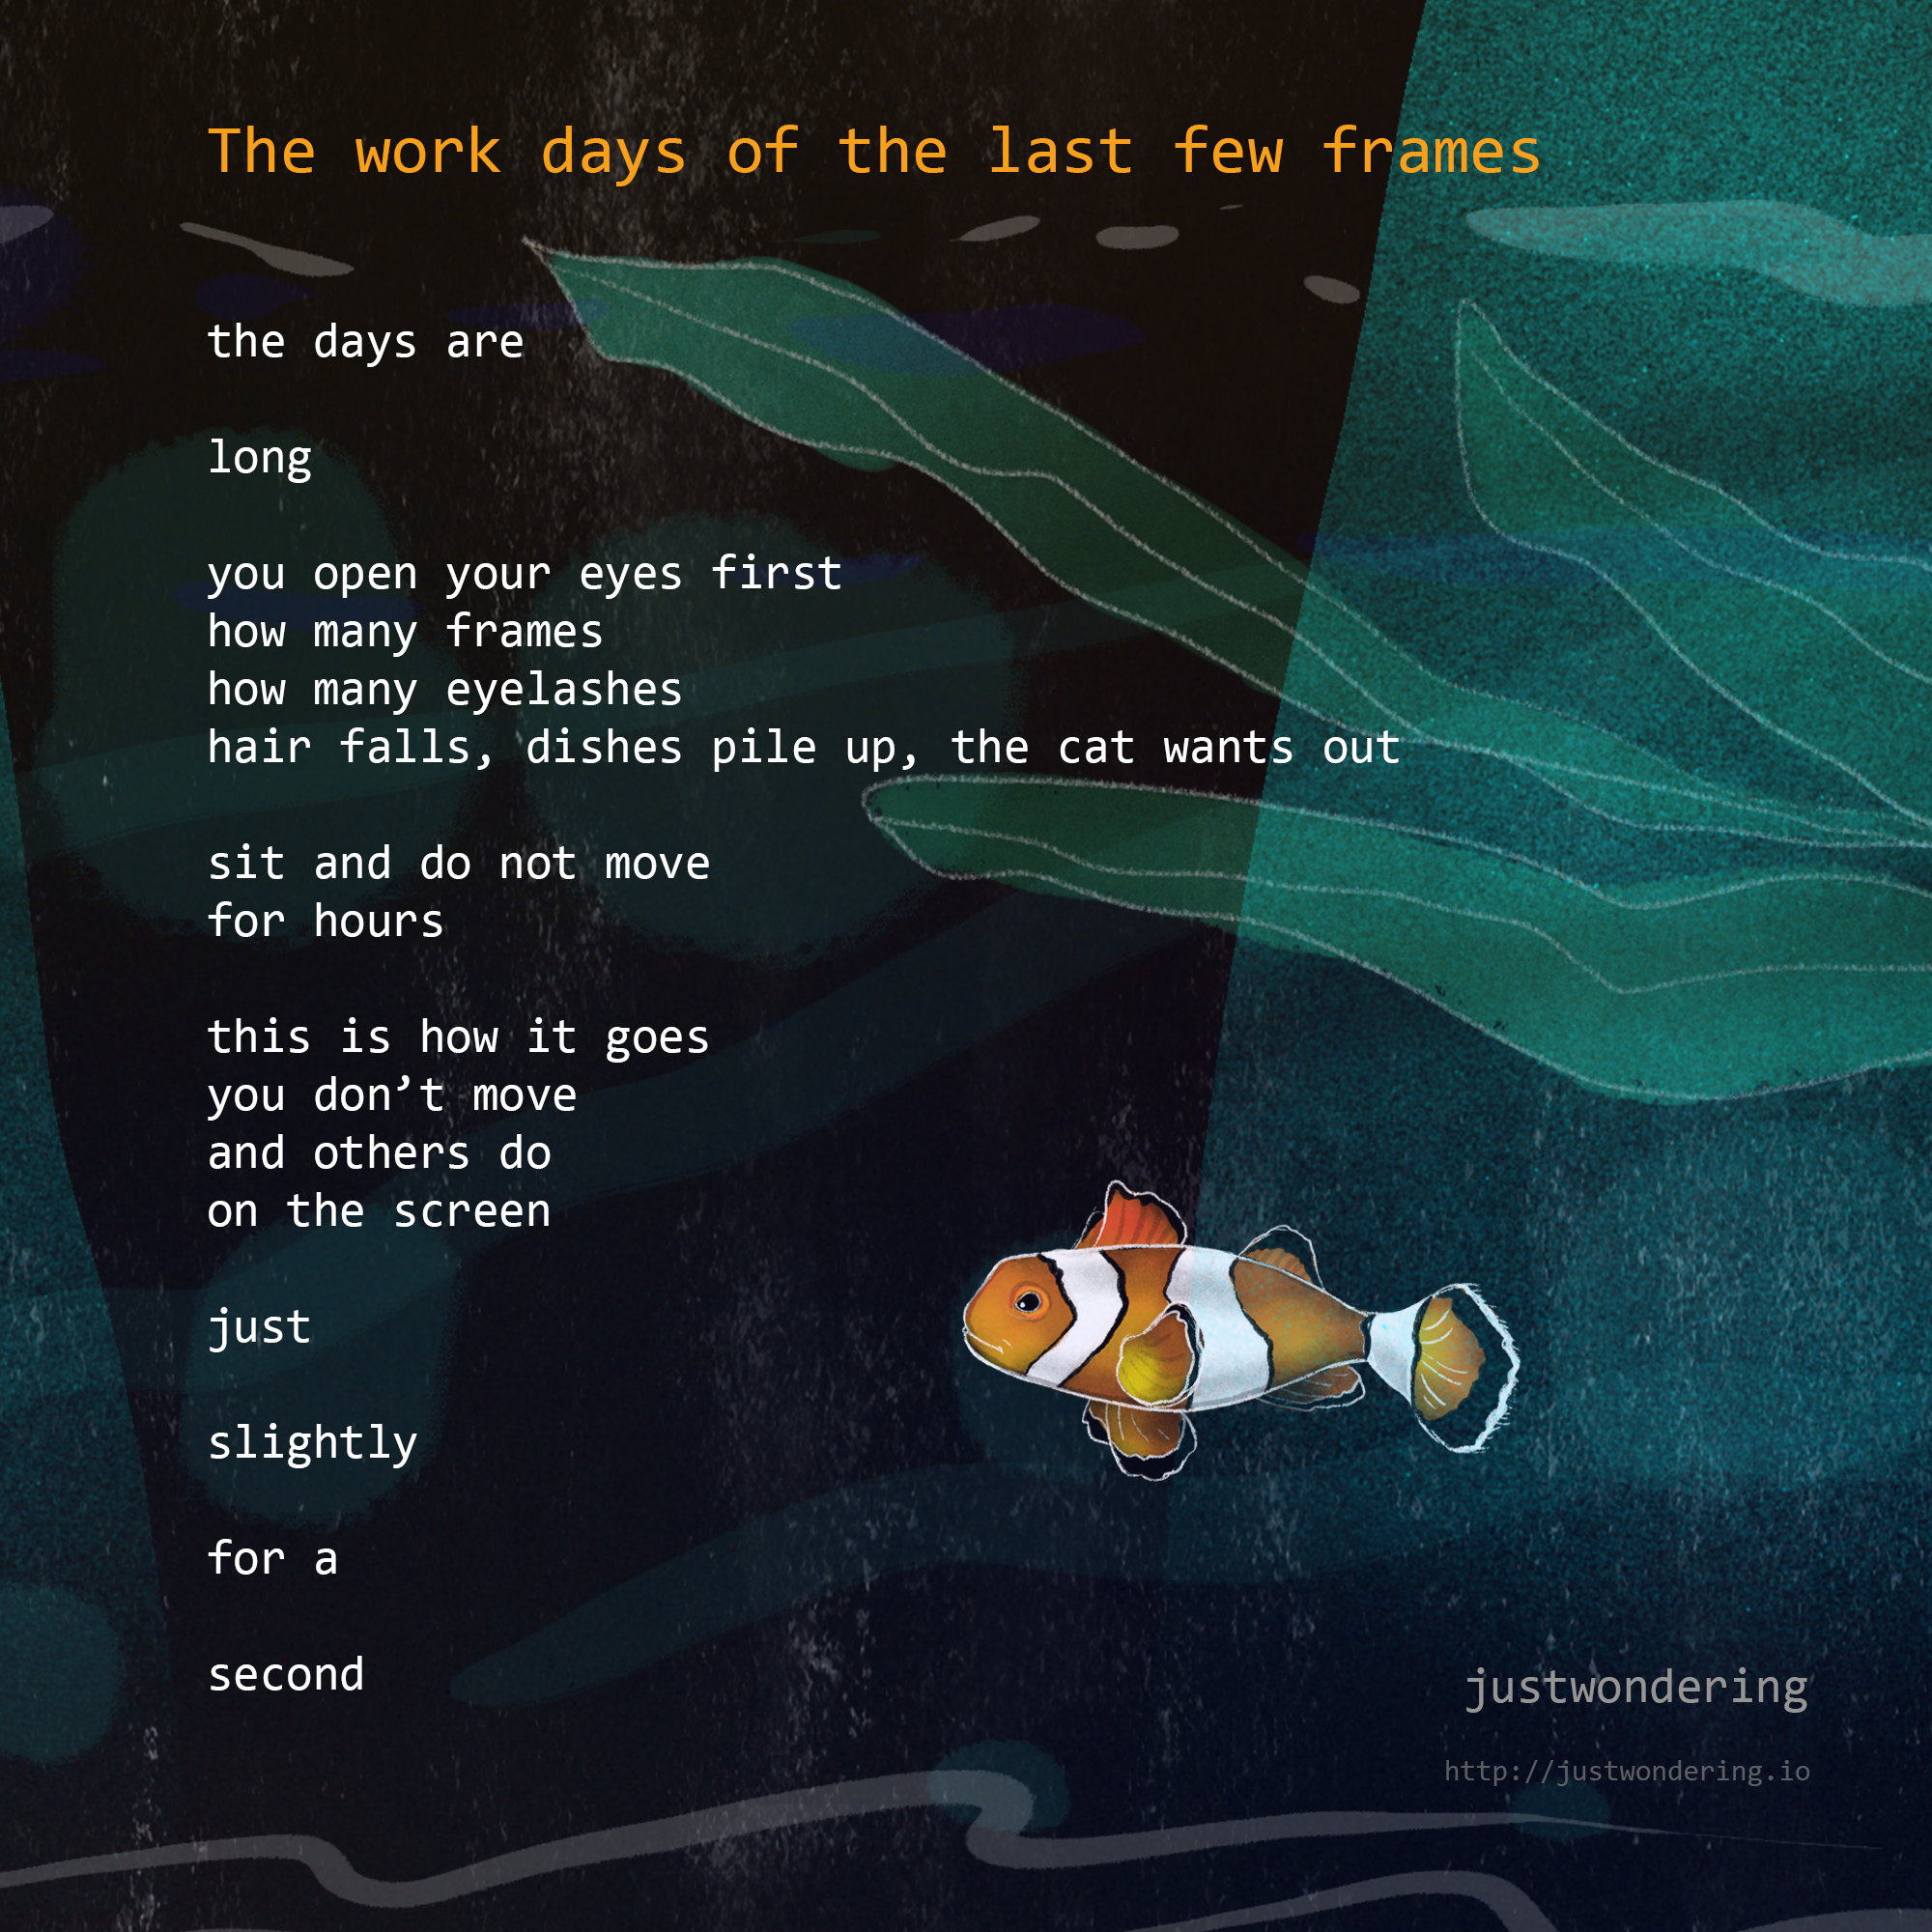 Poem-The work days